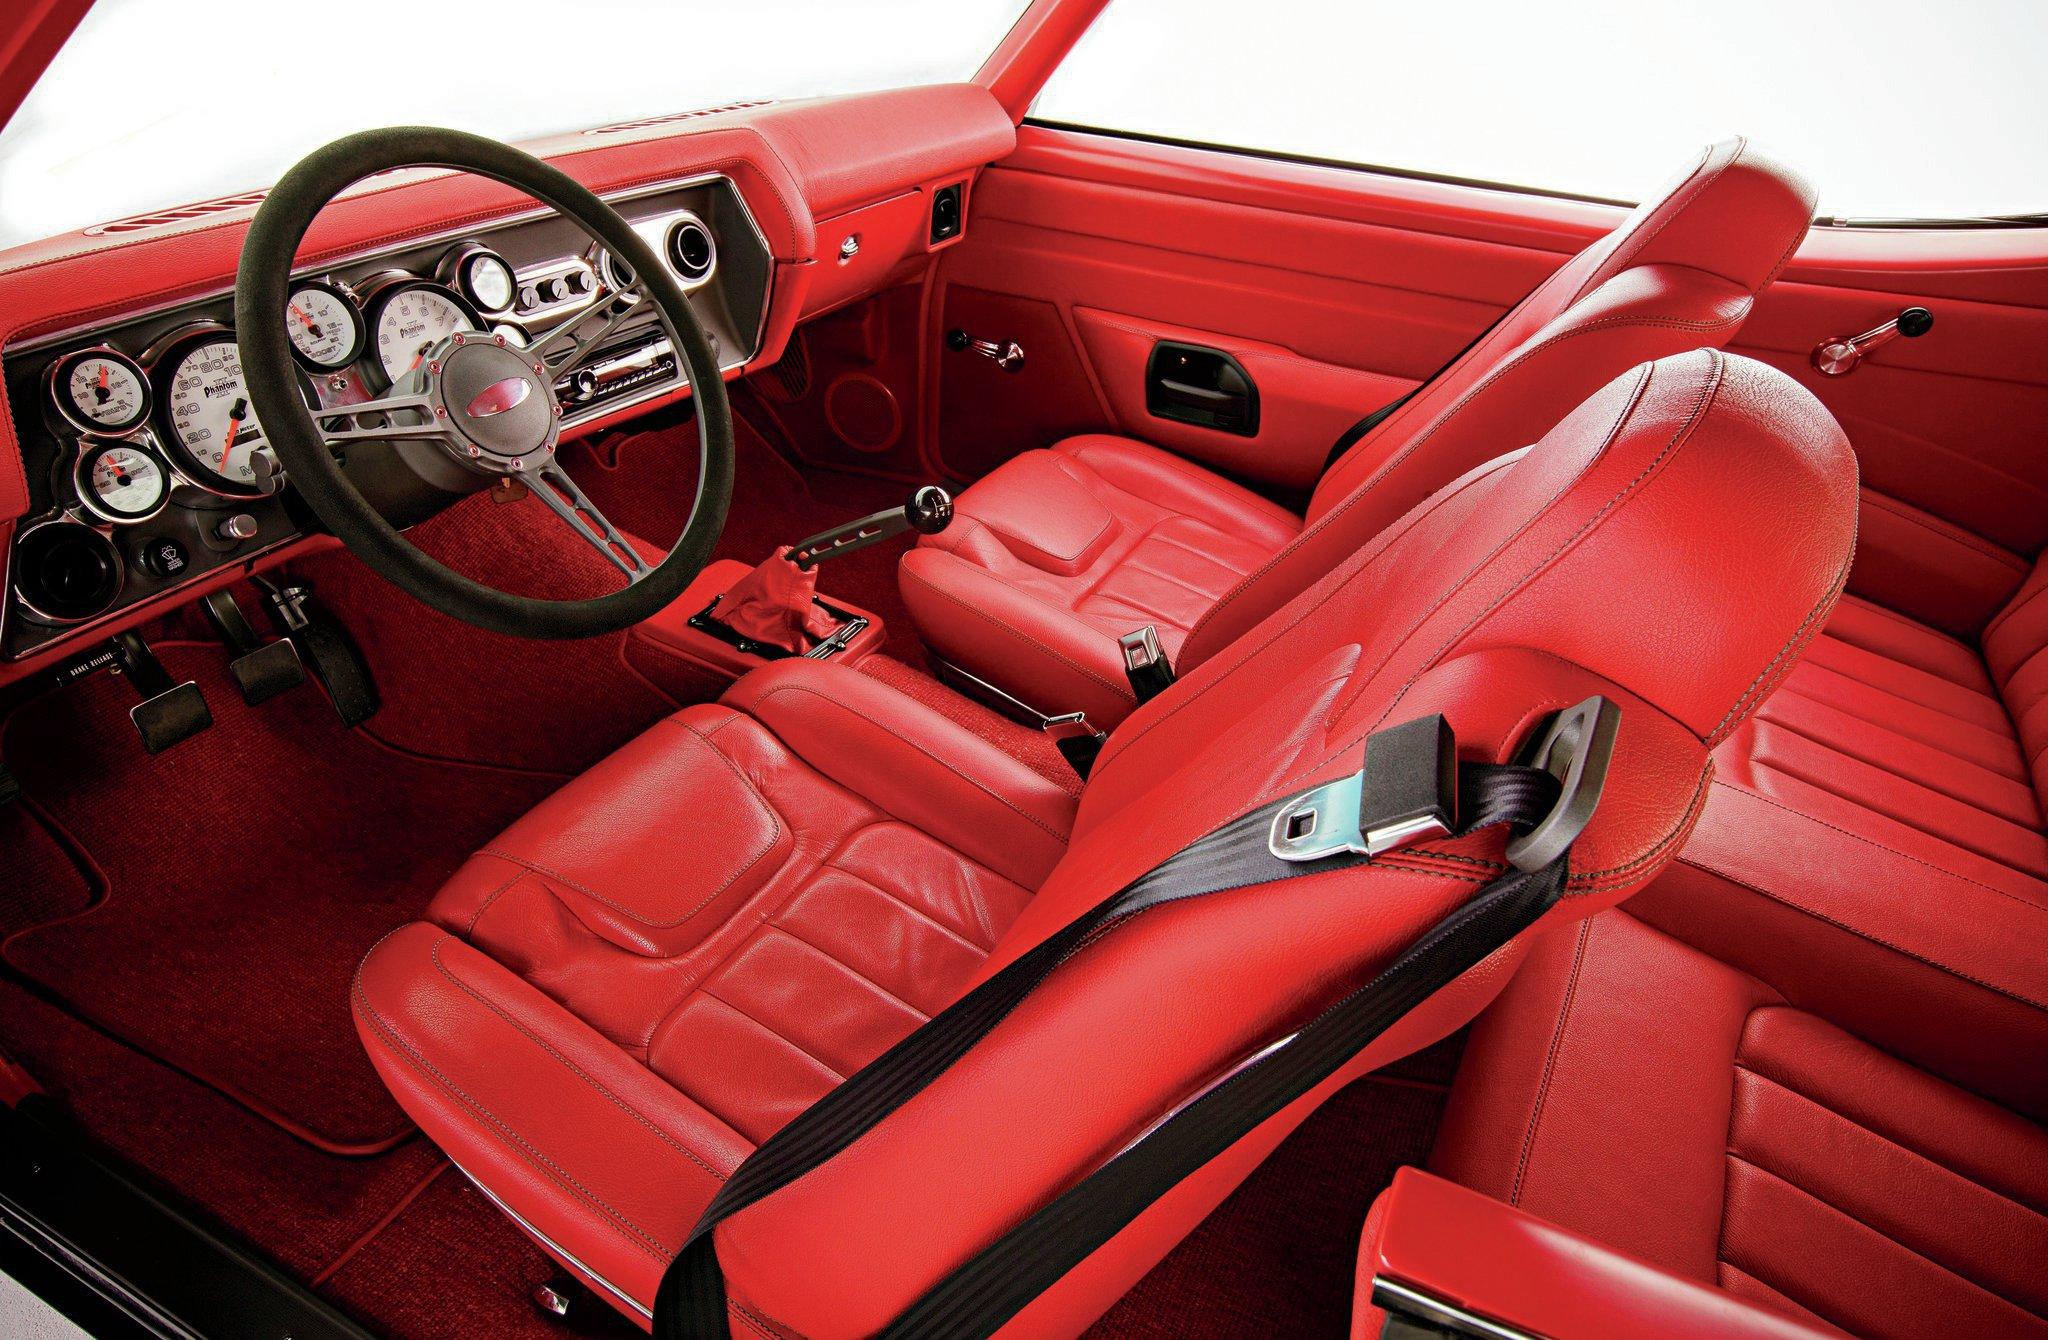 1970 Chevy Chevelle Seats